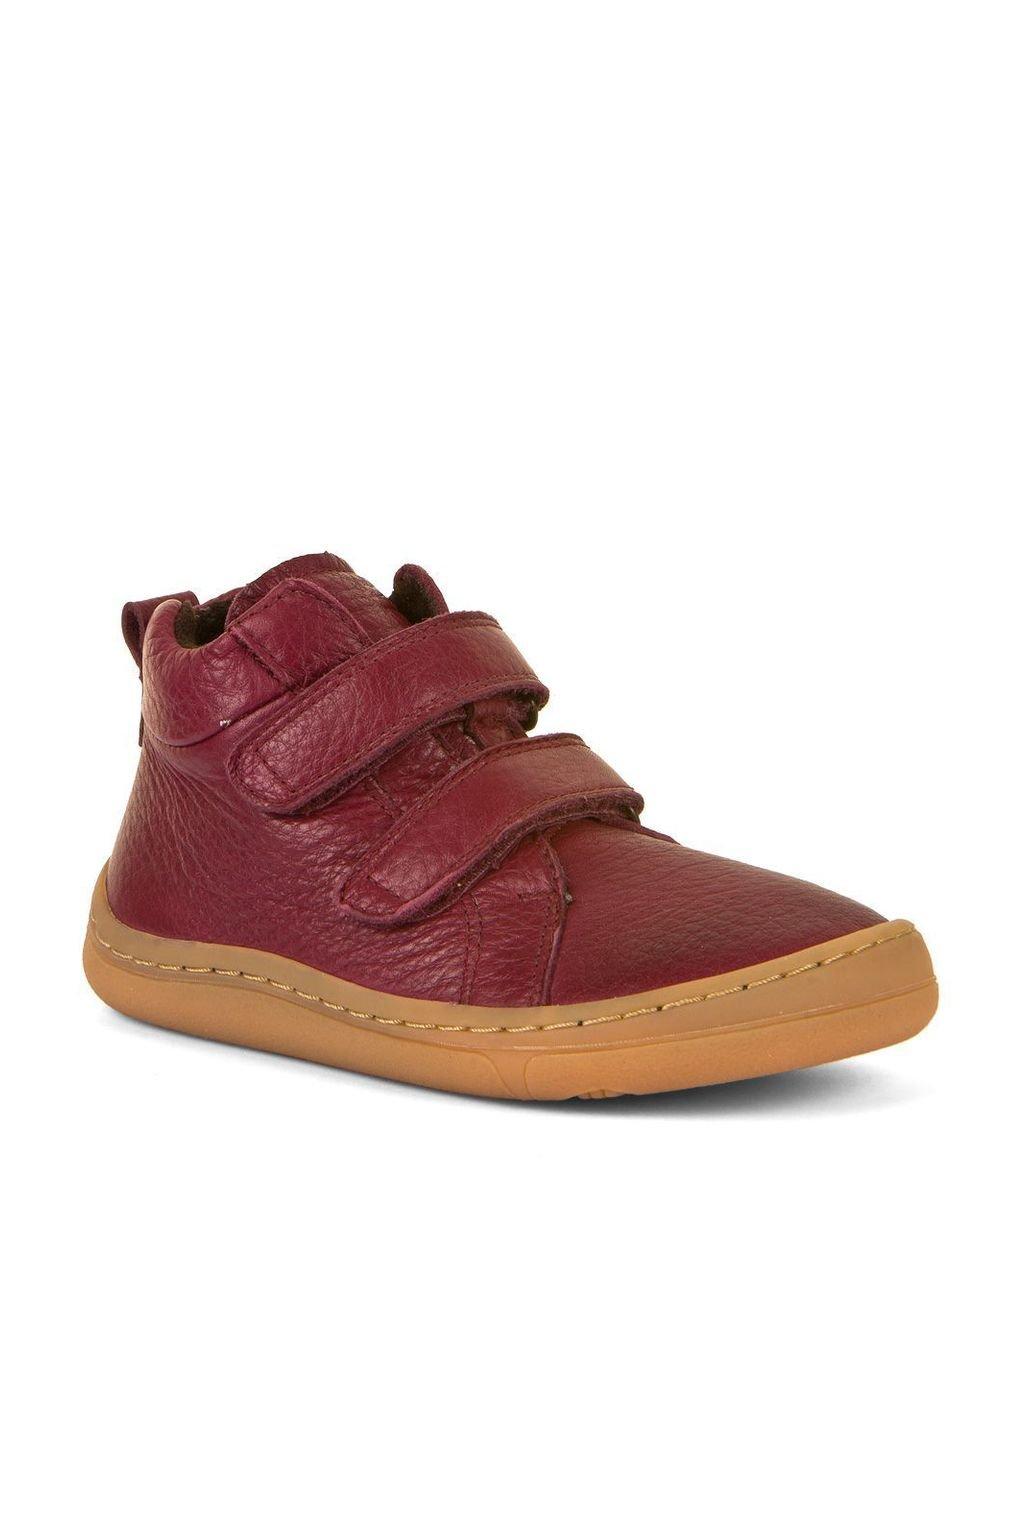 Froddo Barefoot Bordeaux G3110195-4 - celoročné topánky